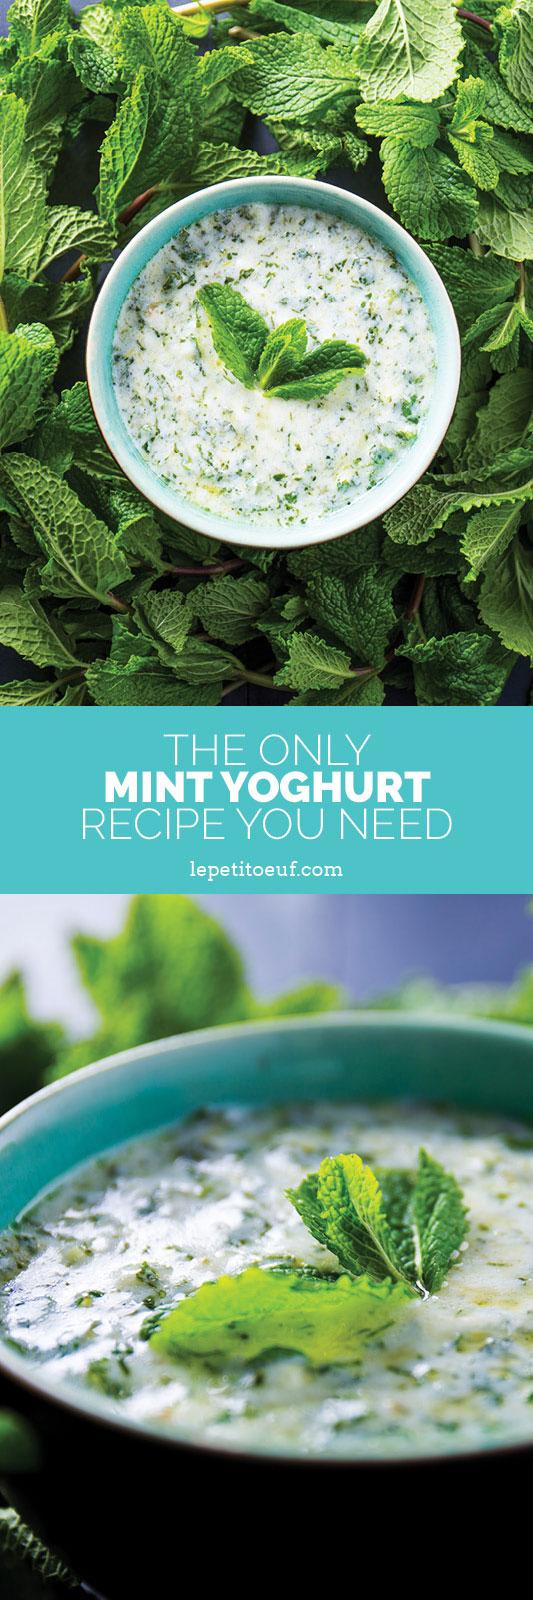 Mint yoghurt